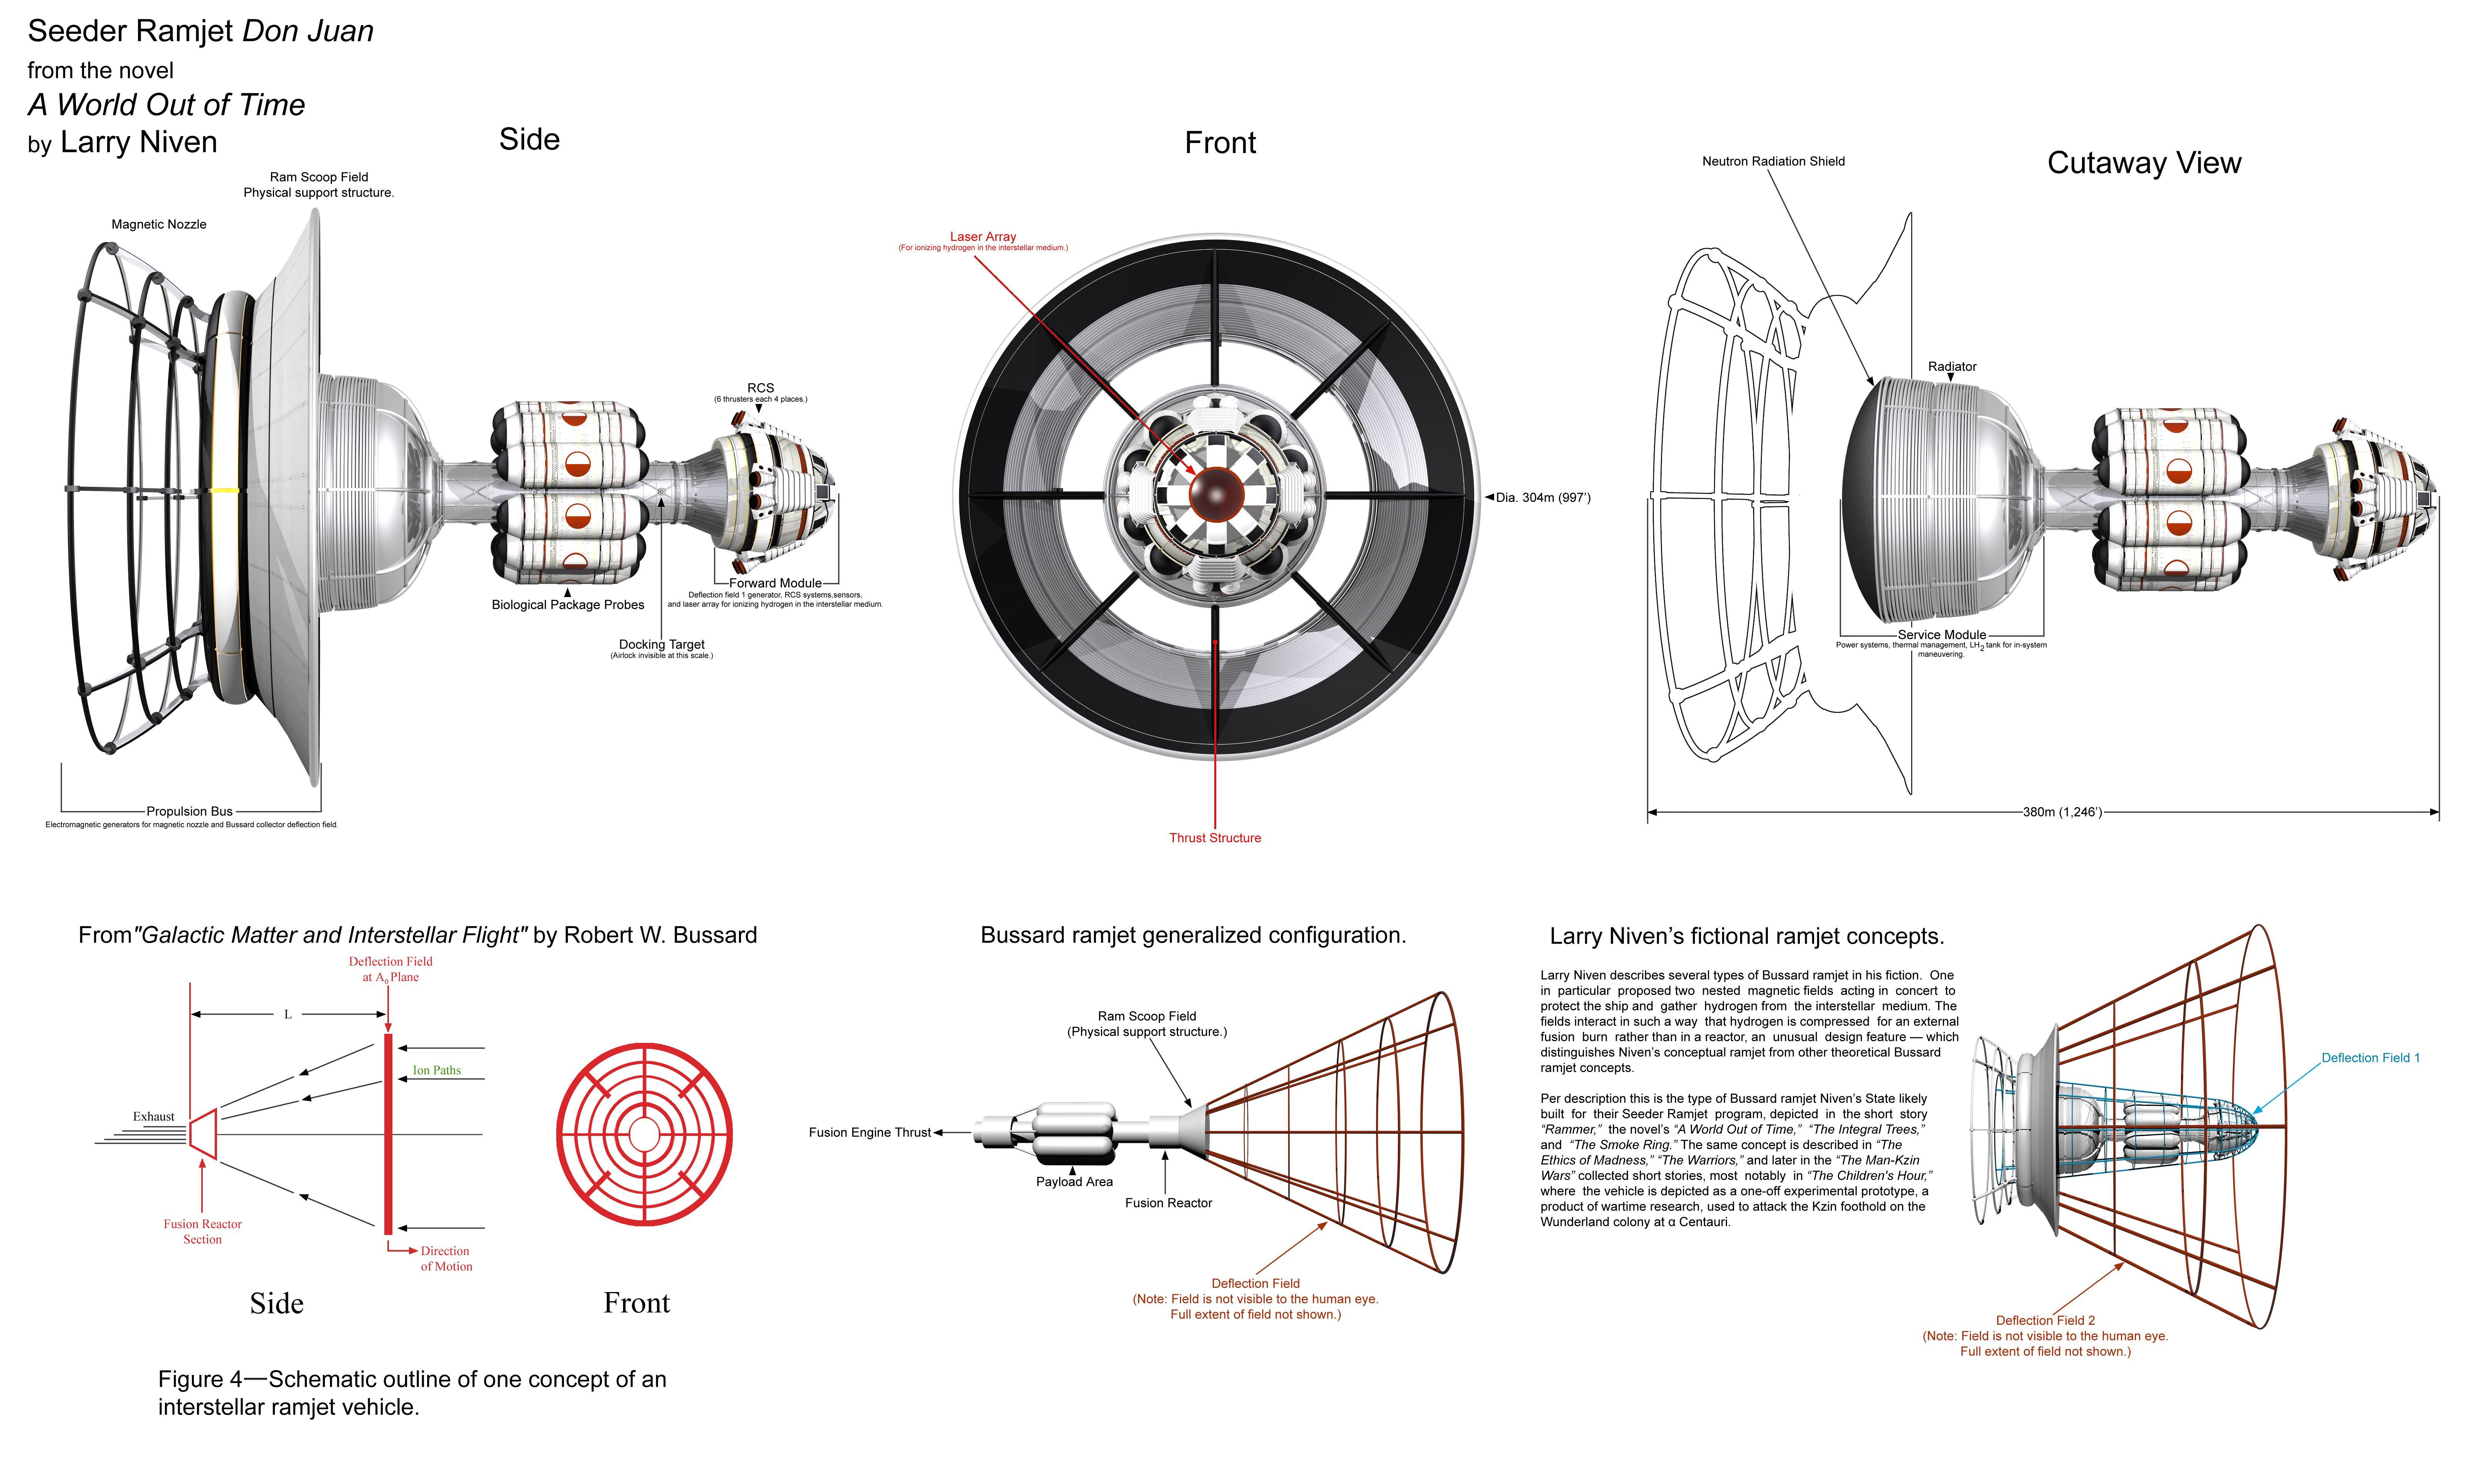 Seeder Ramjet Diagram by William-Black.deviantart.com on